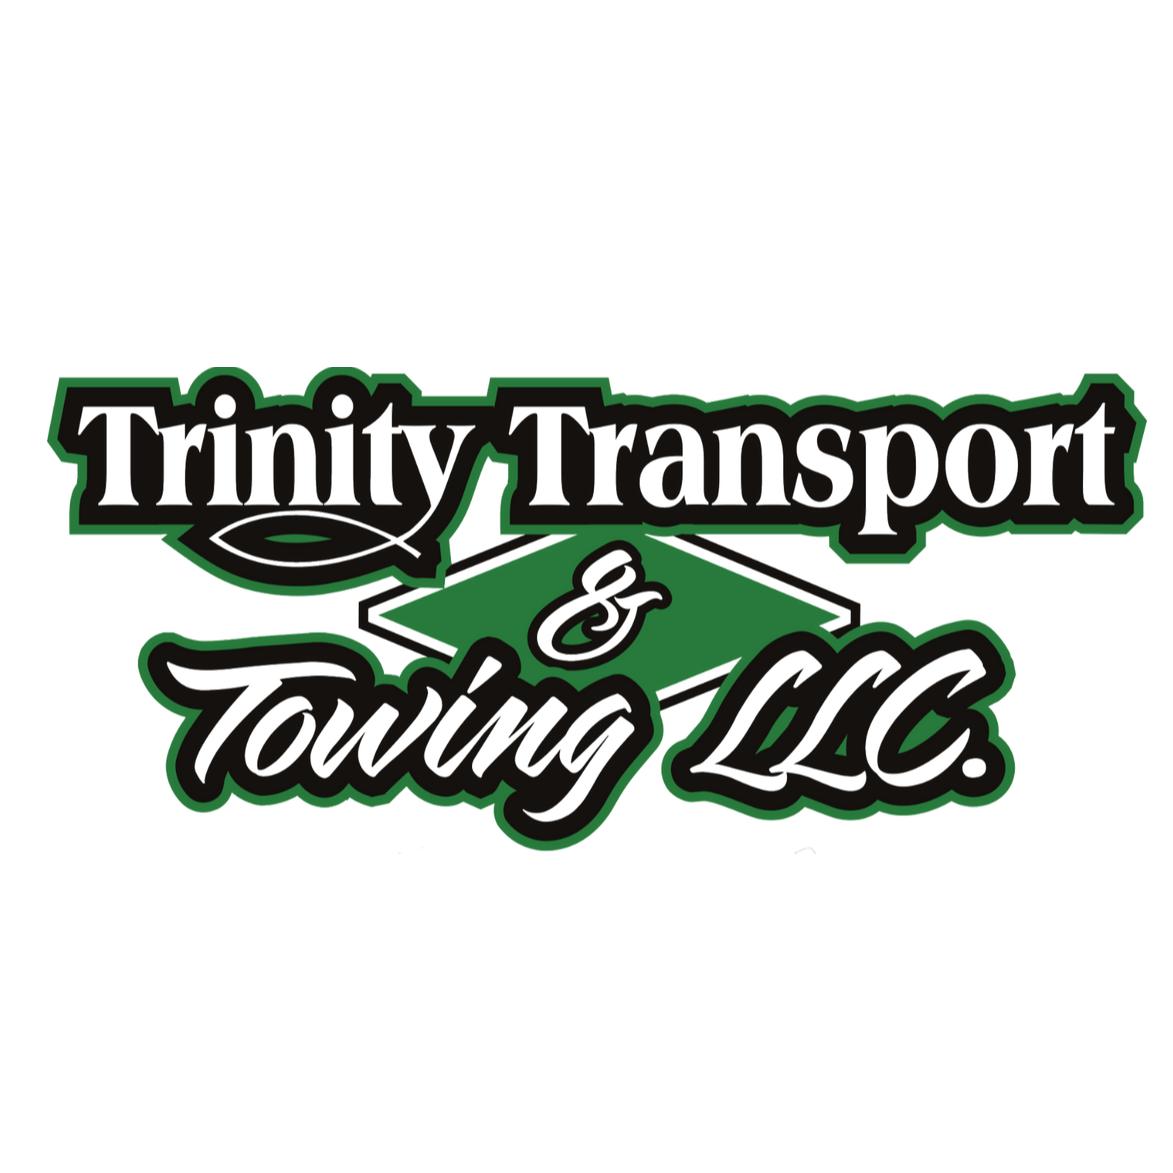 Trinity Transport & Towing, LLC logo